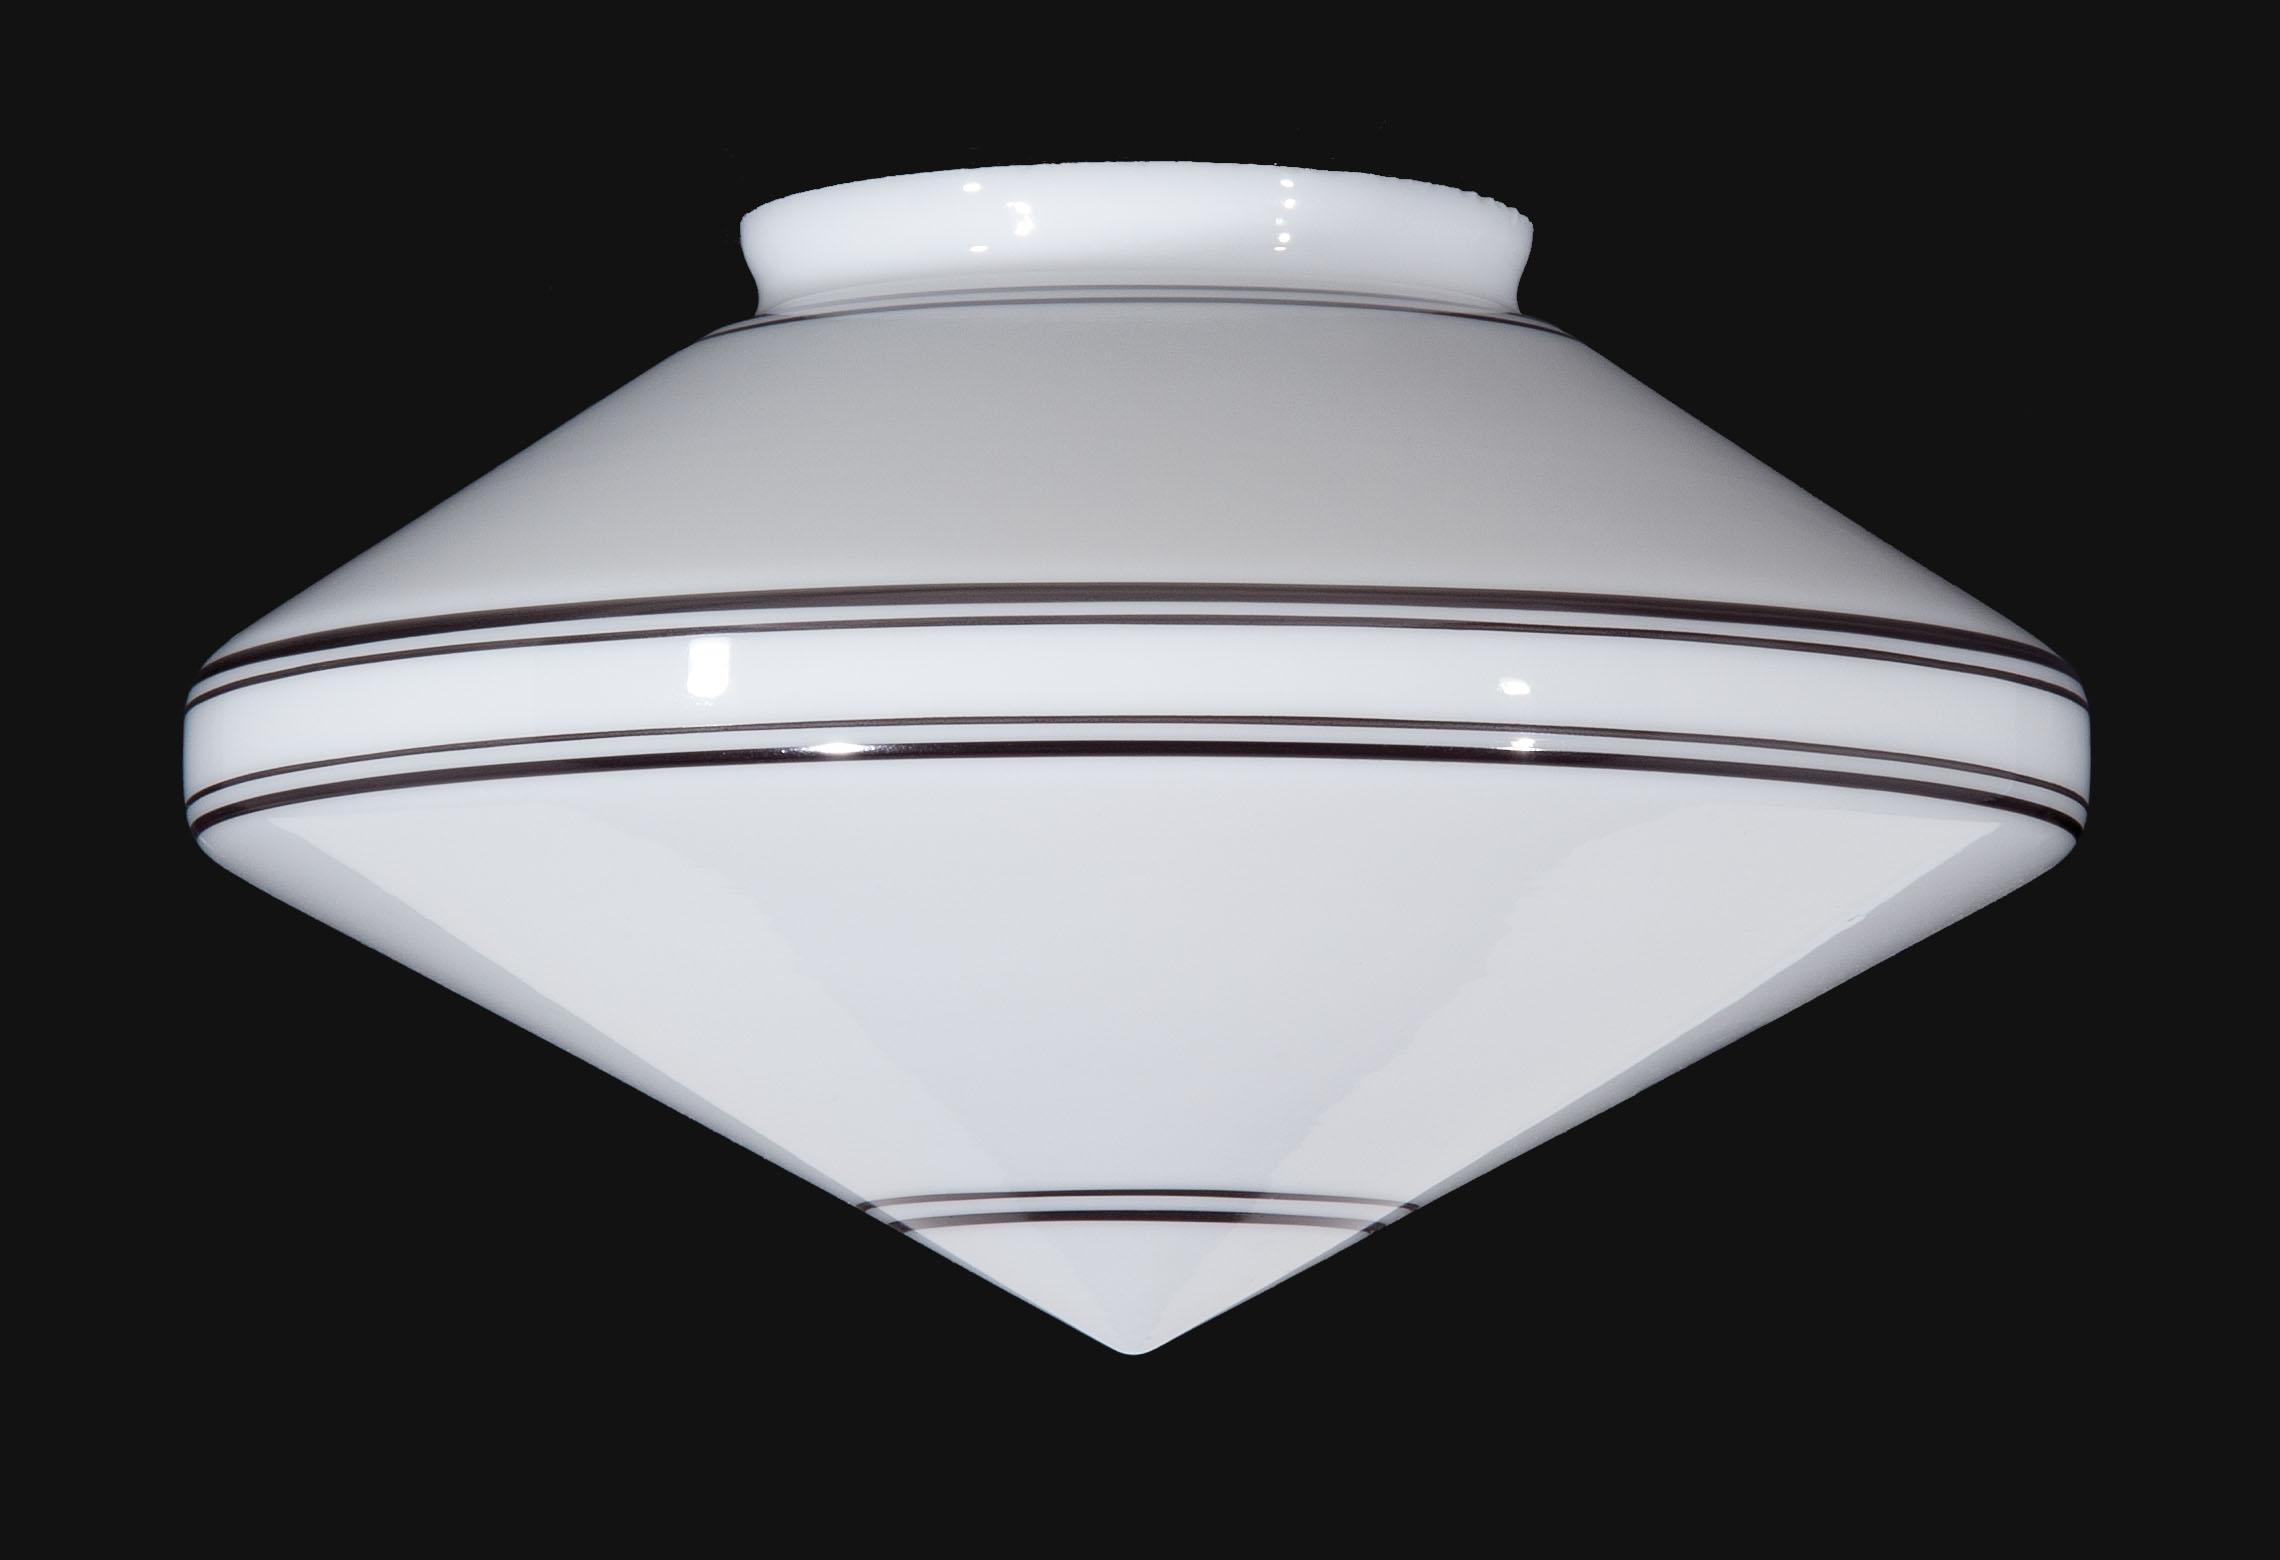 14 Striped Art Deco Pendant Shade 08846 B Amp P Lamp Supply